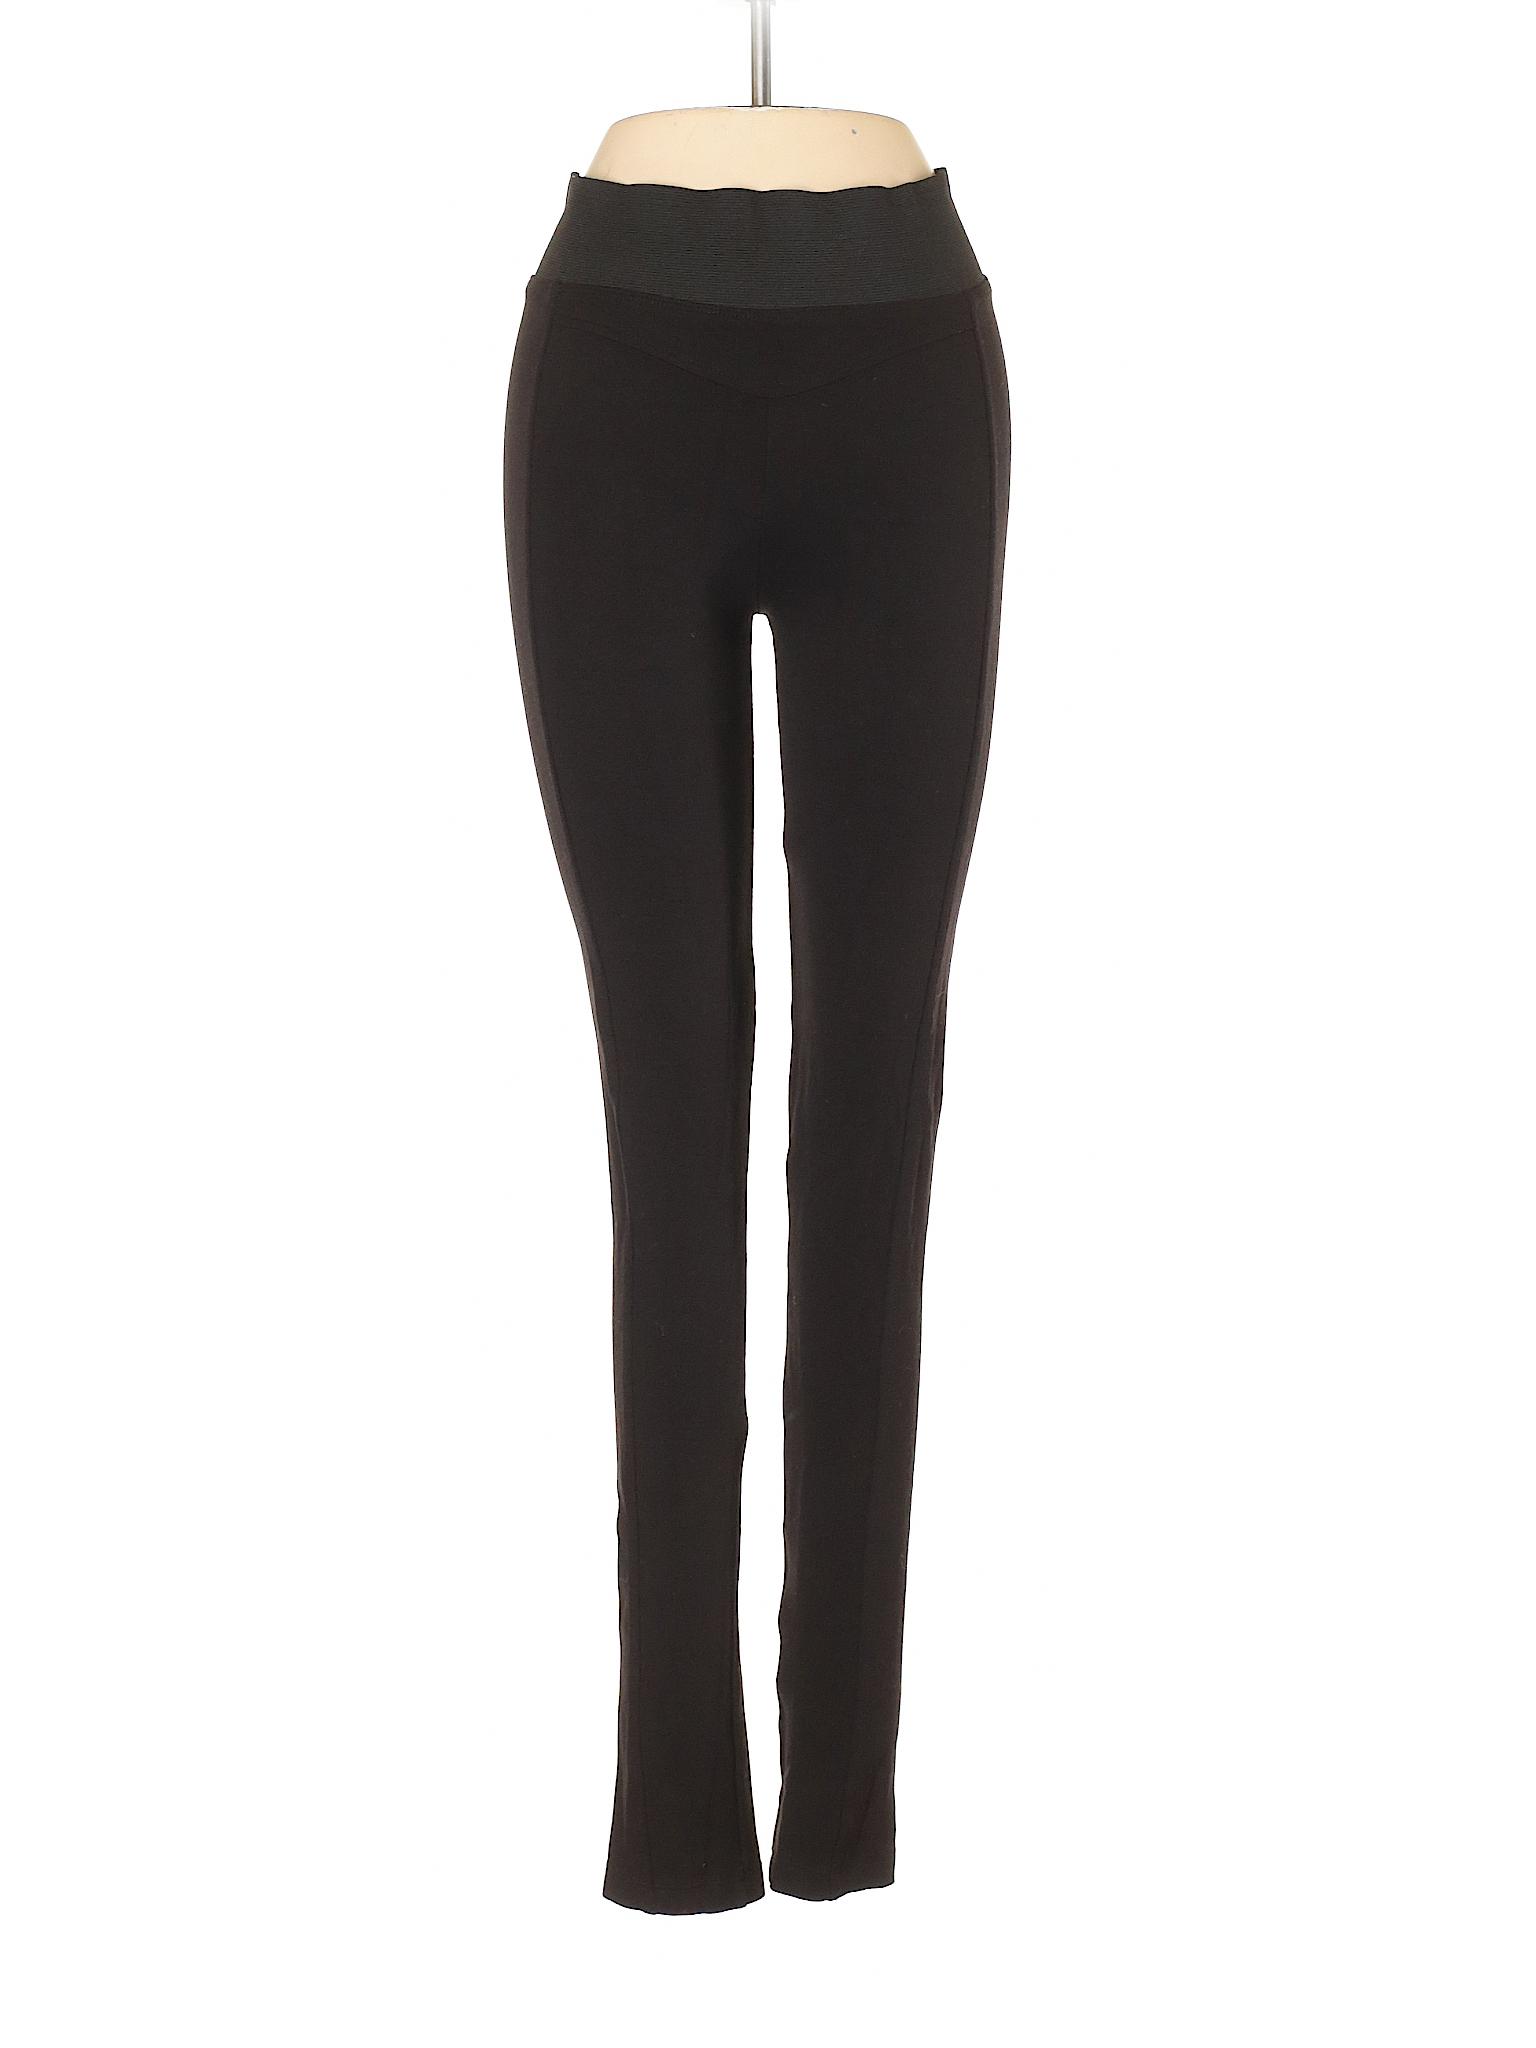 Basic Zara Zara leisure Boutique leisure Leggings Boutique leisure Leggings Boutique Zara Basic Basic dxqwnf